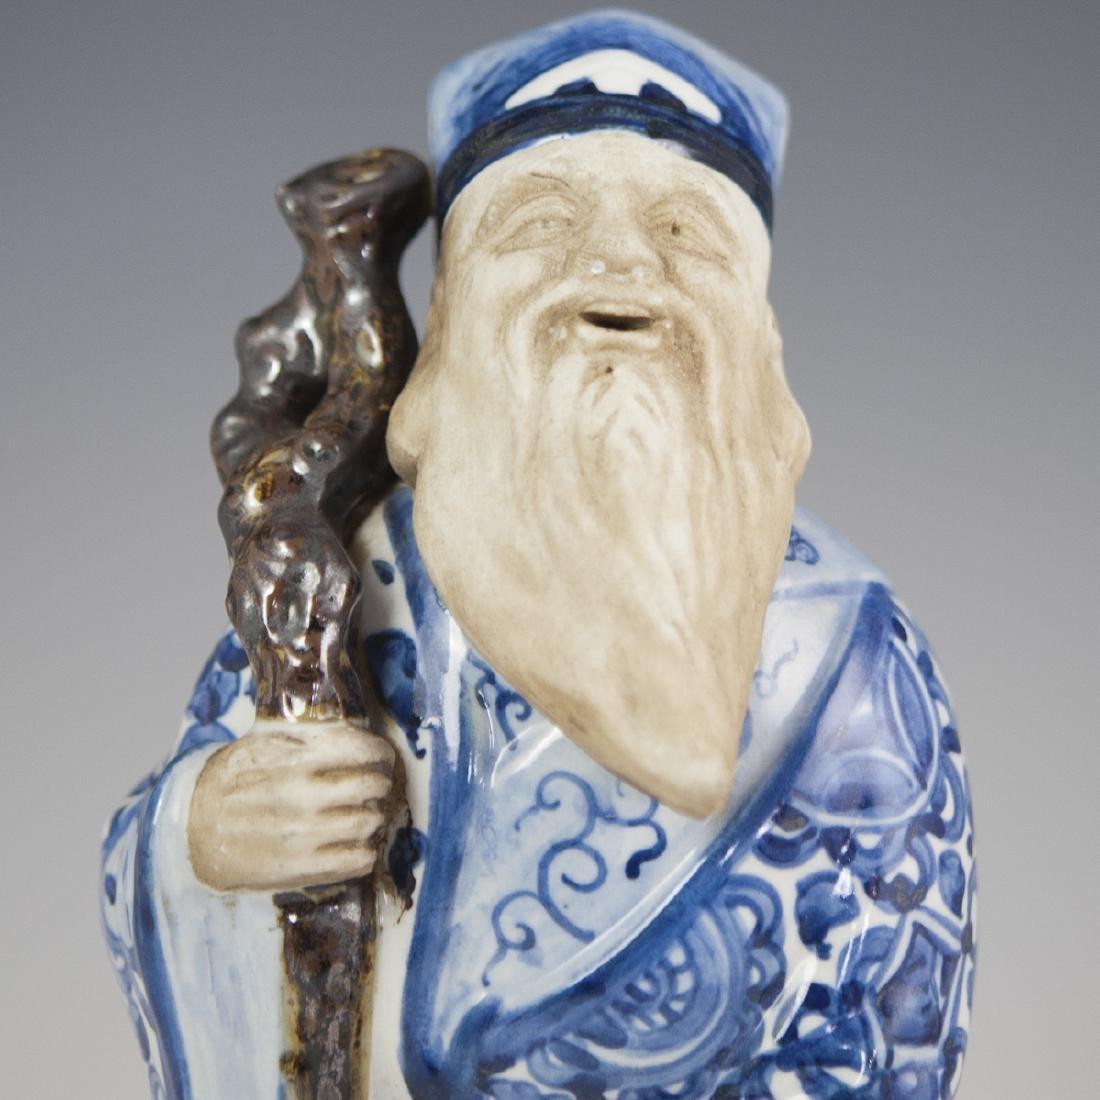 Chinese Glazed Pottery Shou Xing Figurine - 2